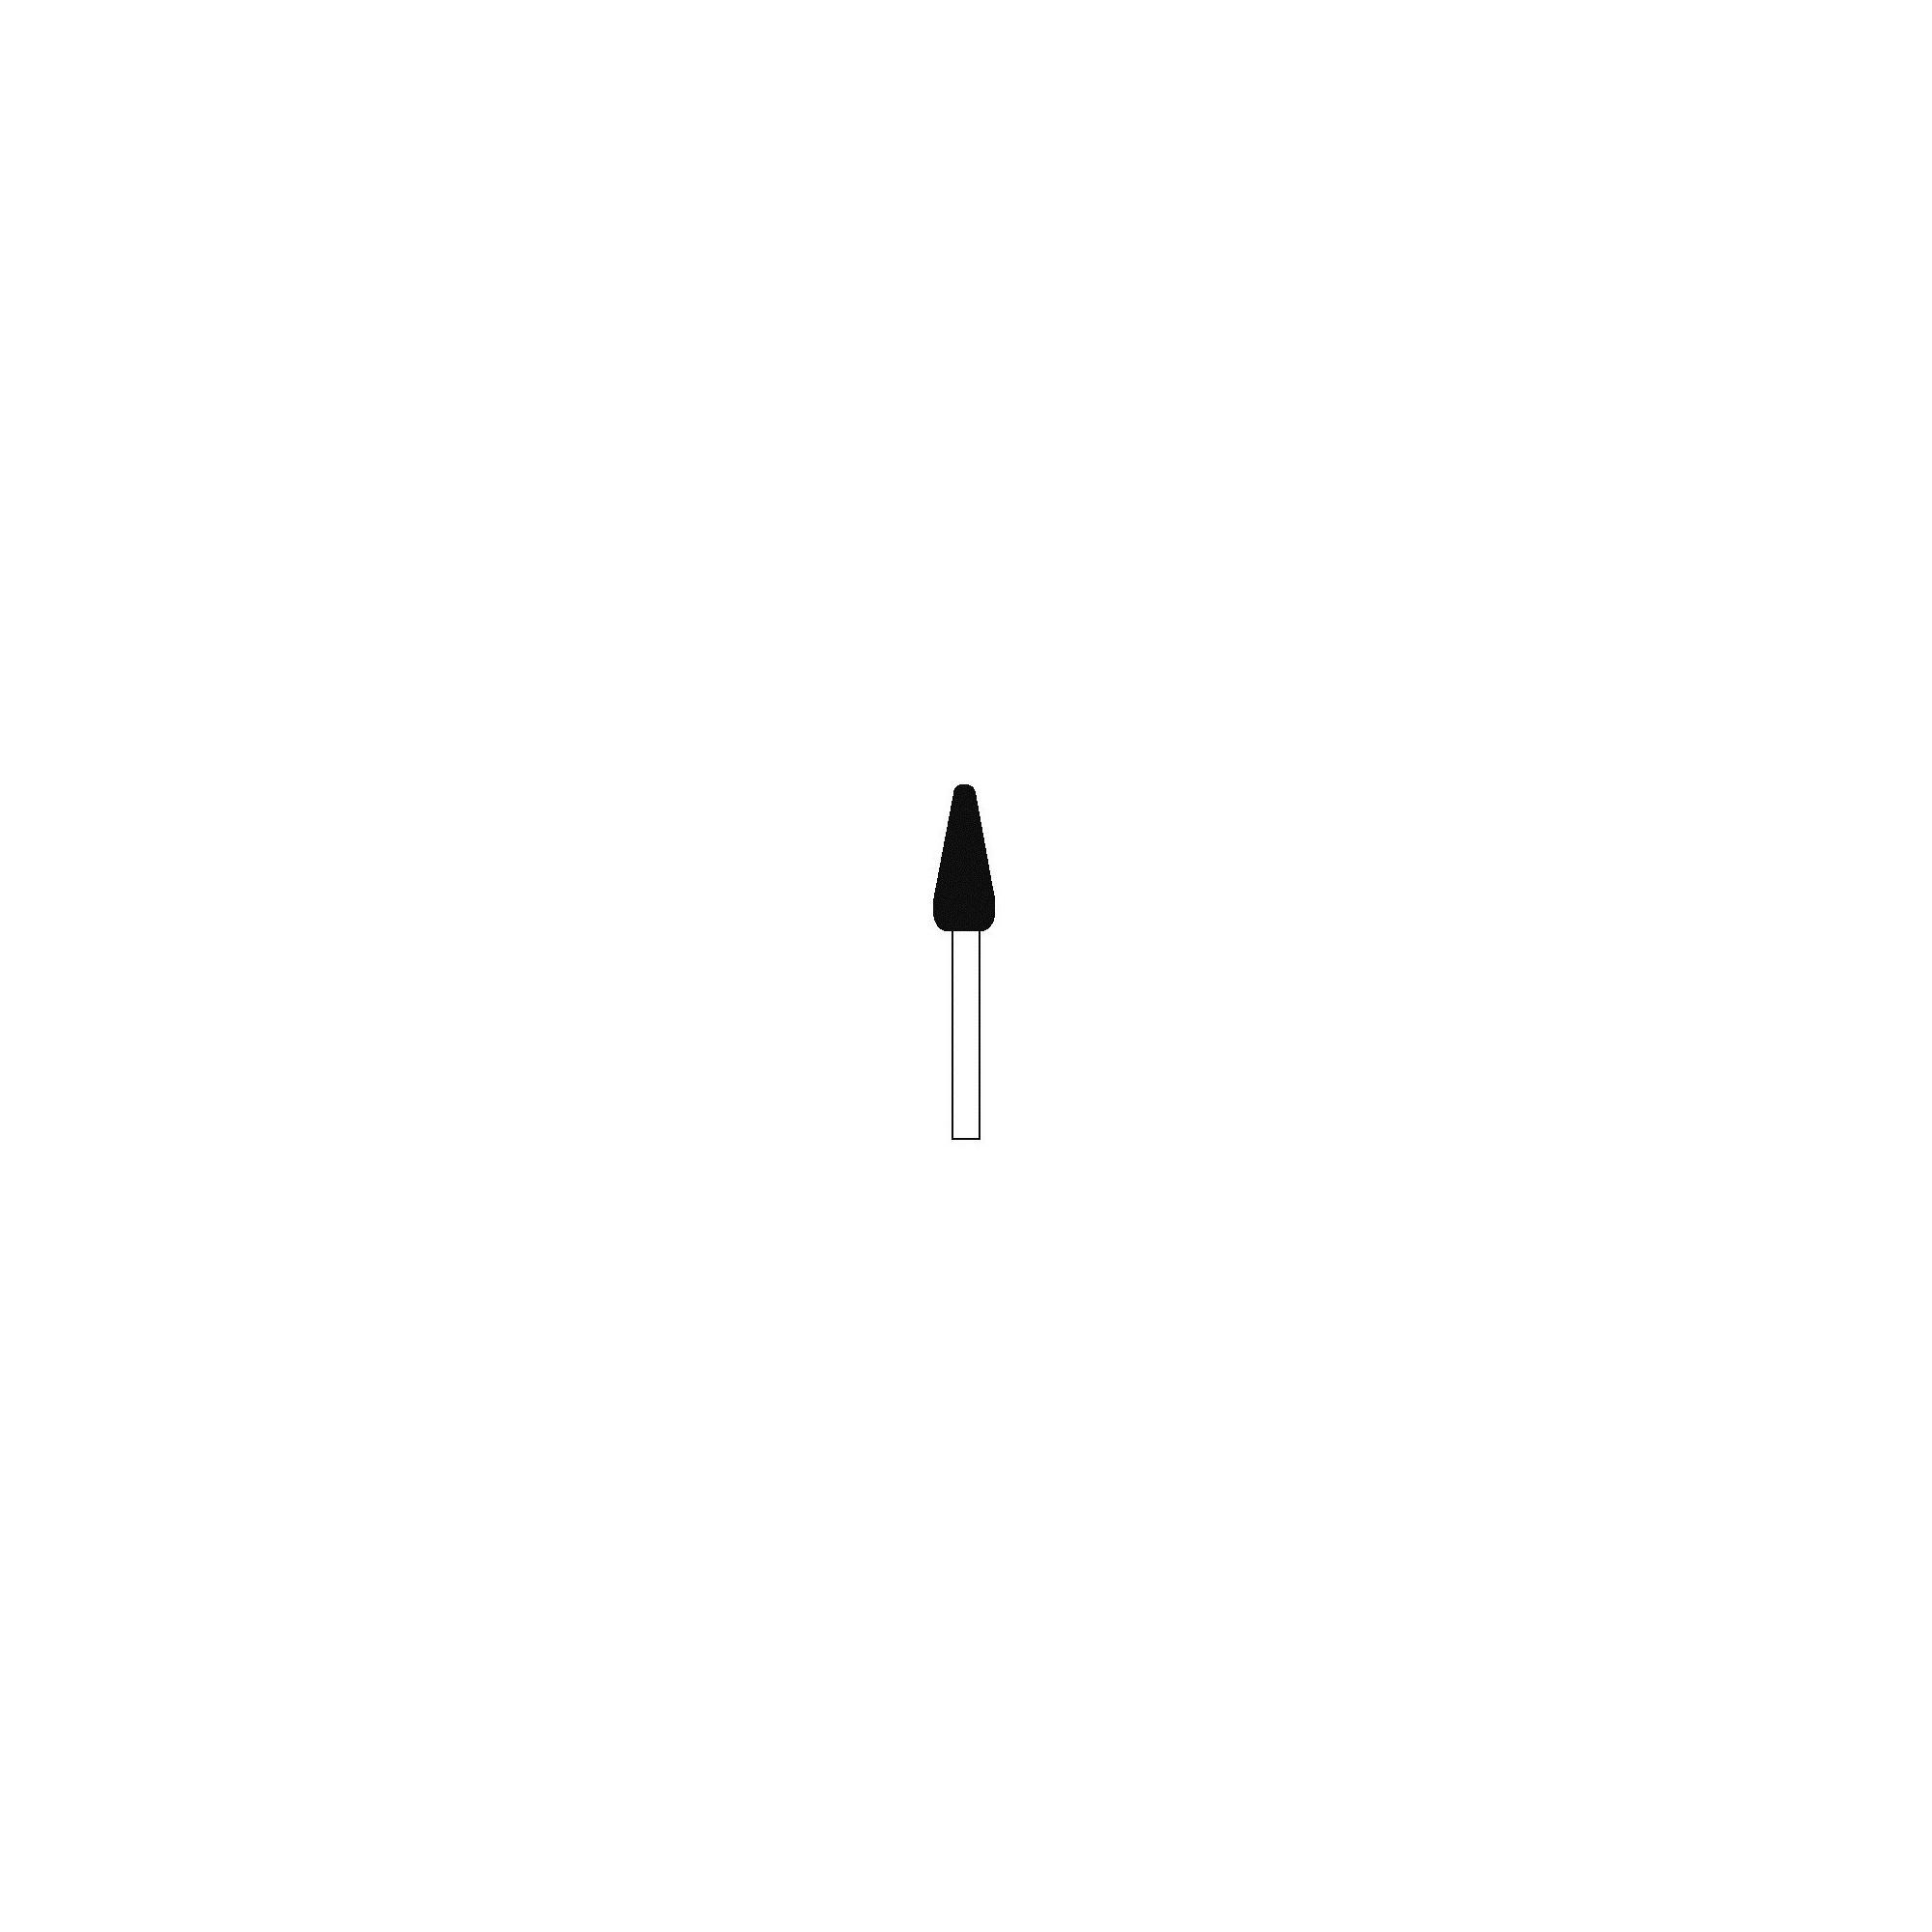 Fraise 45013112 Rubis - Orthoplasties - 2,35mm